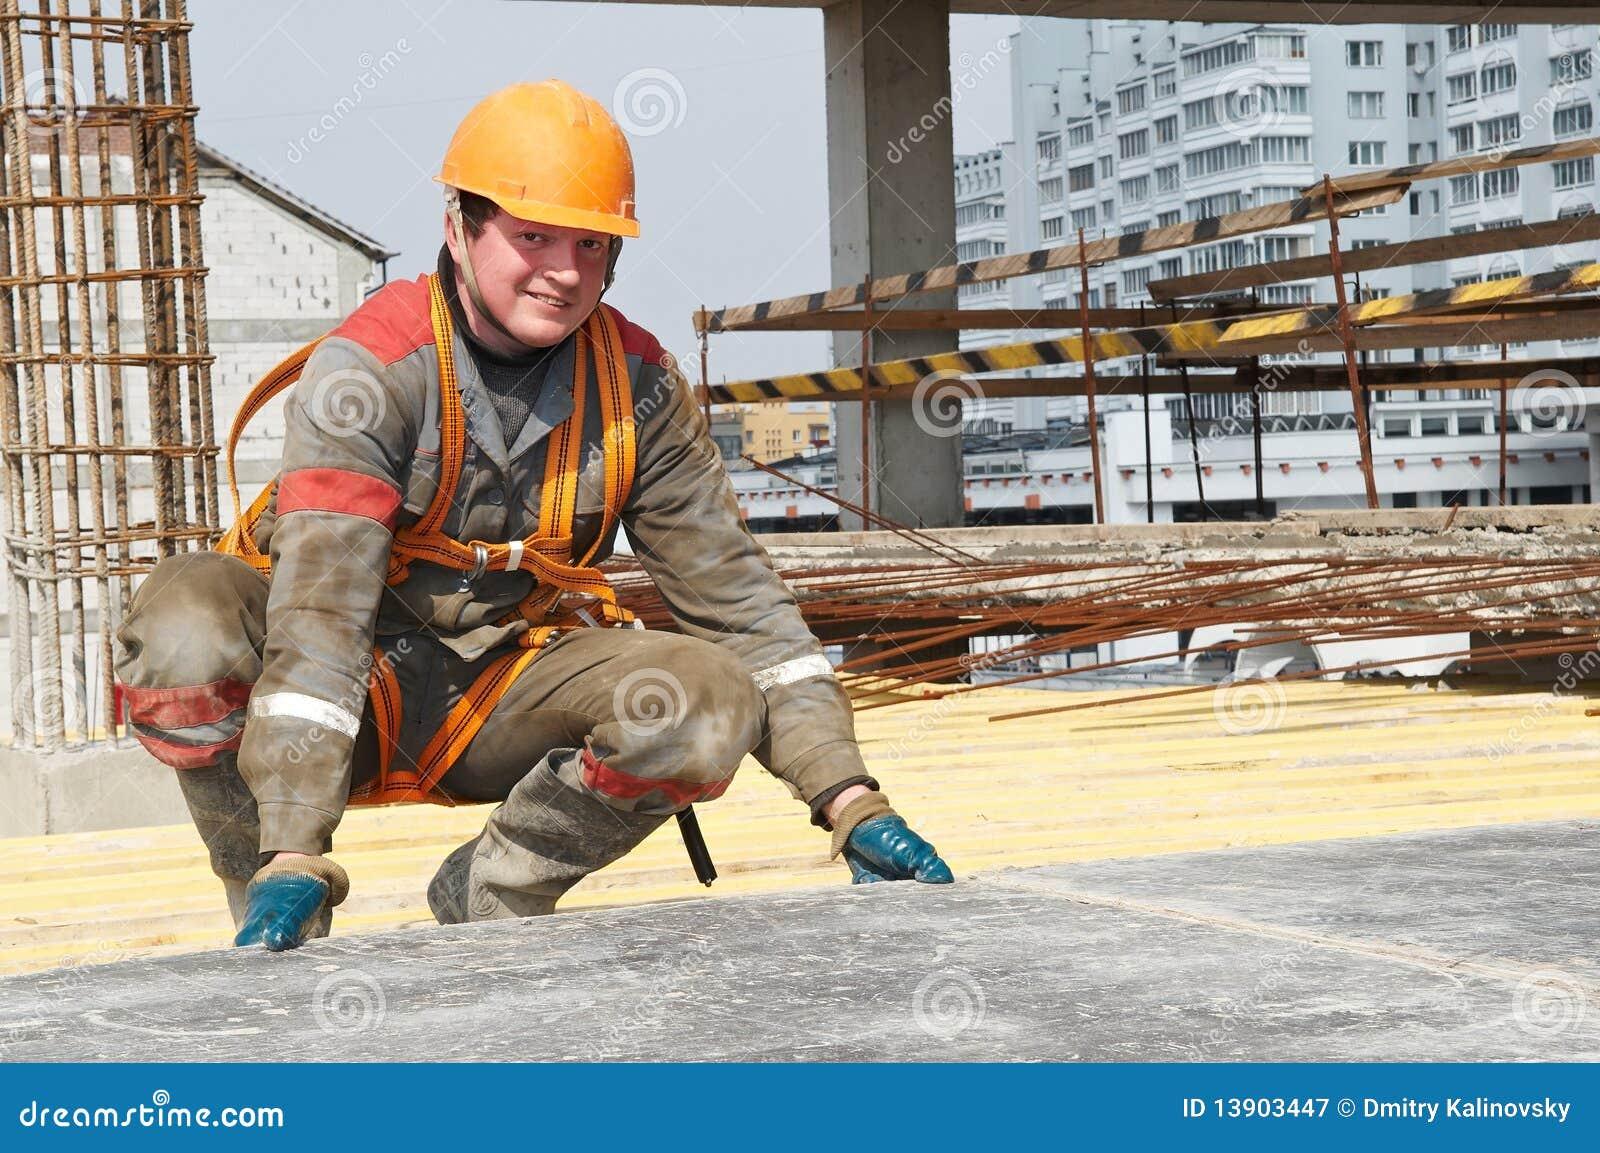 Construction Worker Job Description Samples